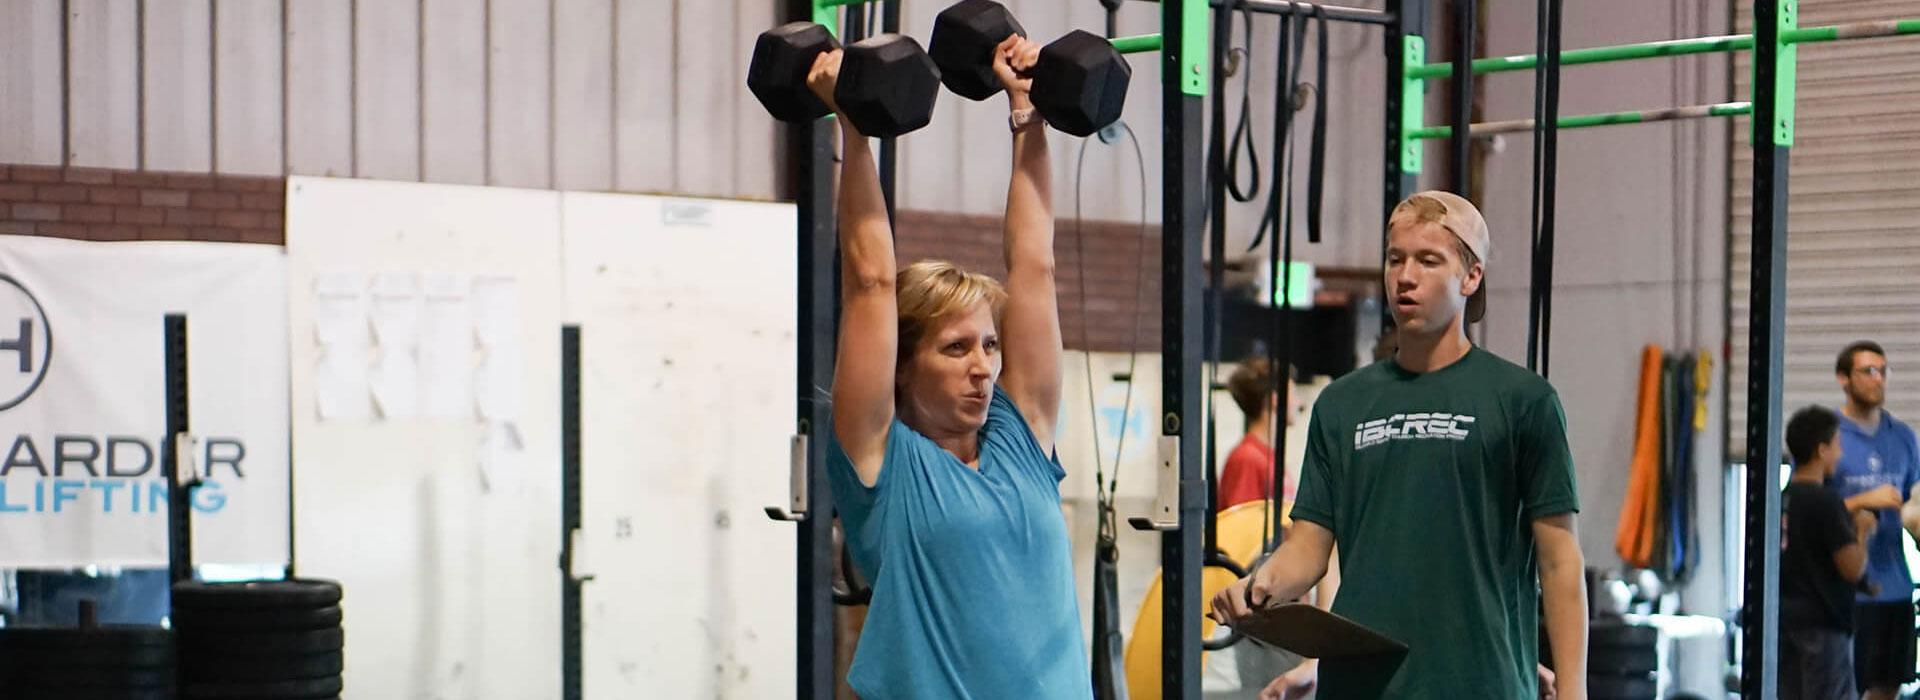 Personal Fitness Training in Odessa FL, Personal Fitness Training near Odessa FL, Personal Fitness Training near Tampa FL